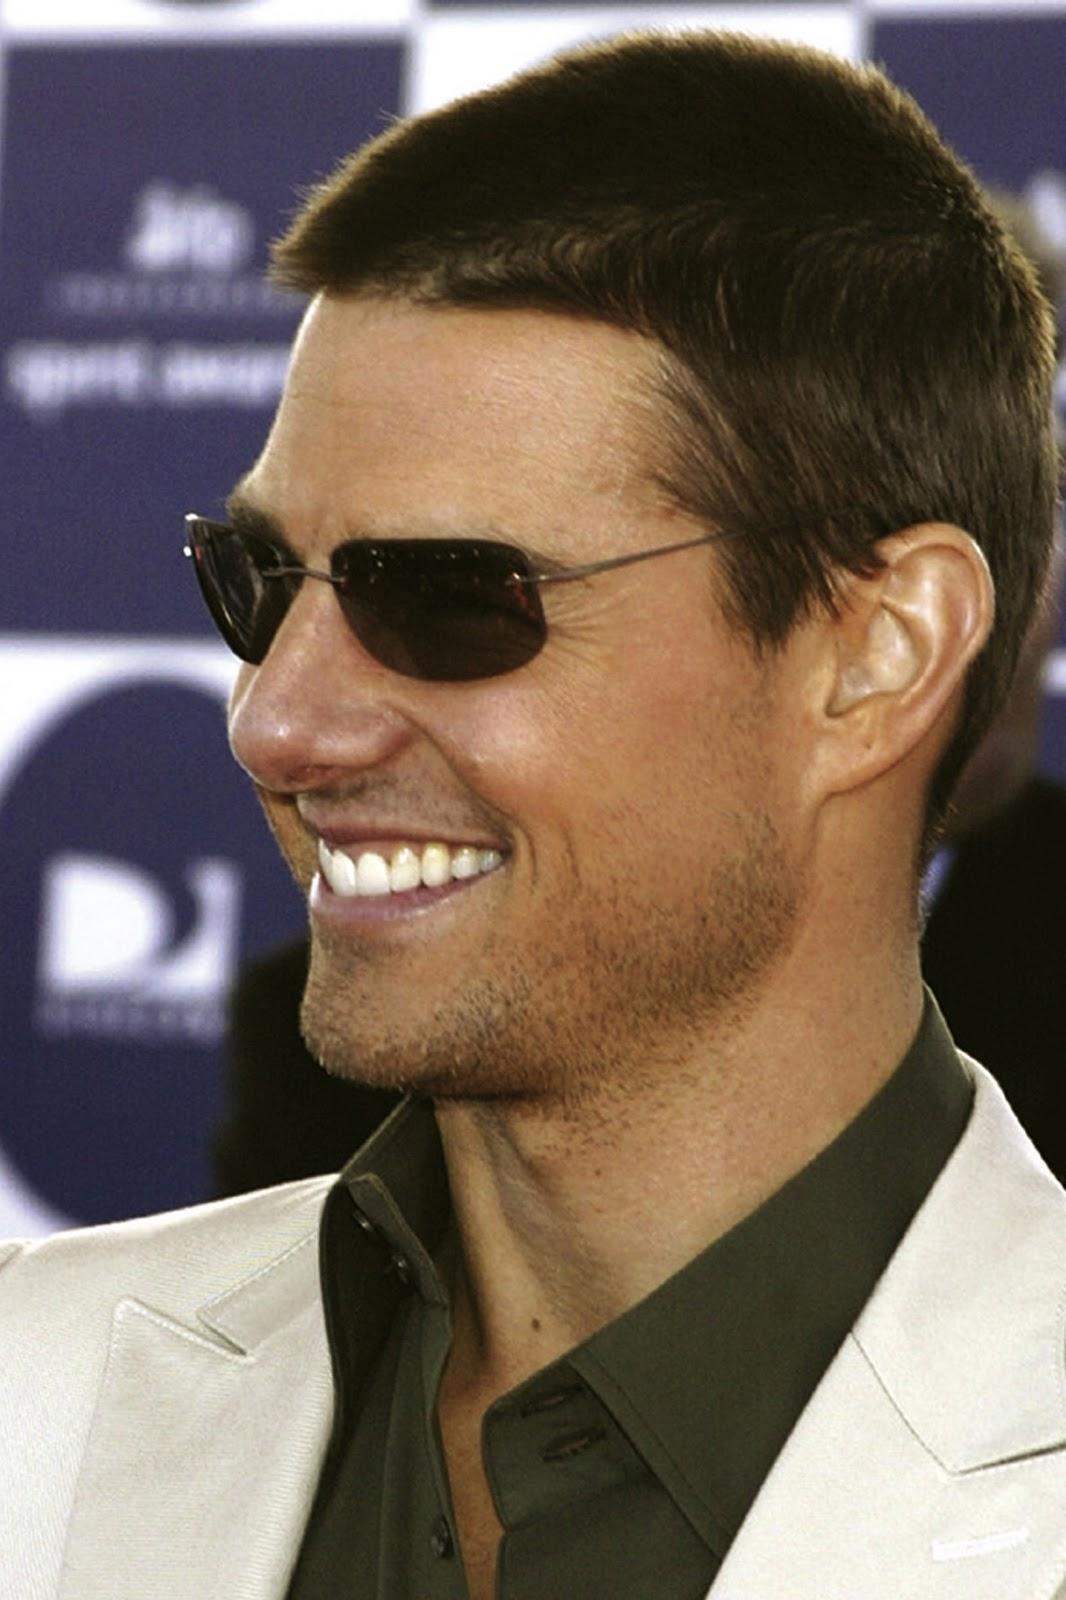 Beauty39s Blog Tom Cruise Hairstyles The Sleek Style Of Tom Cruise